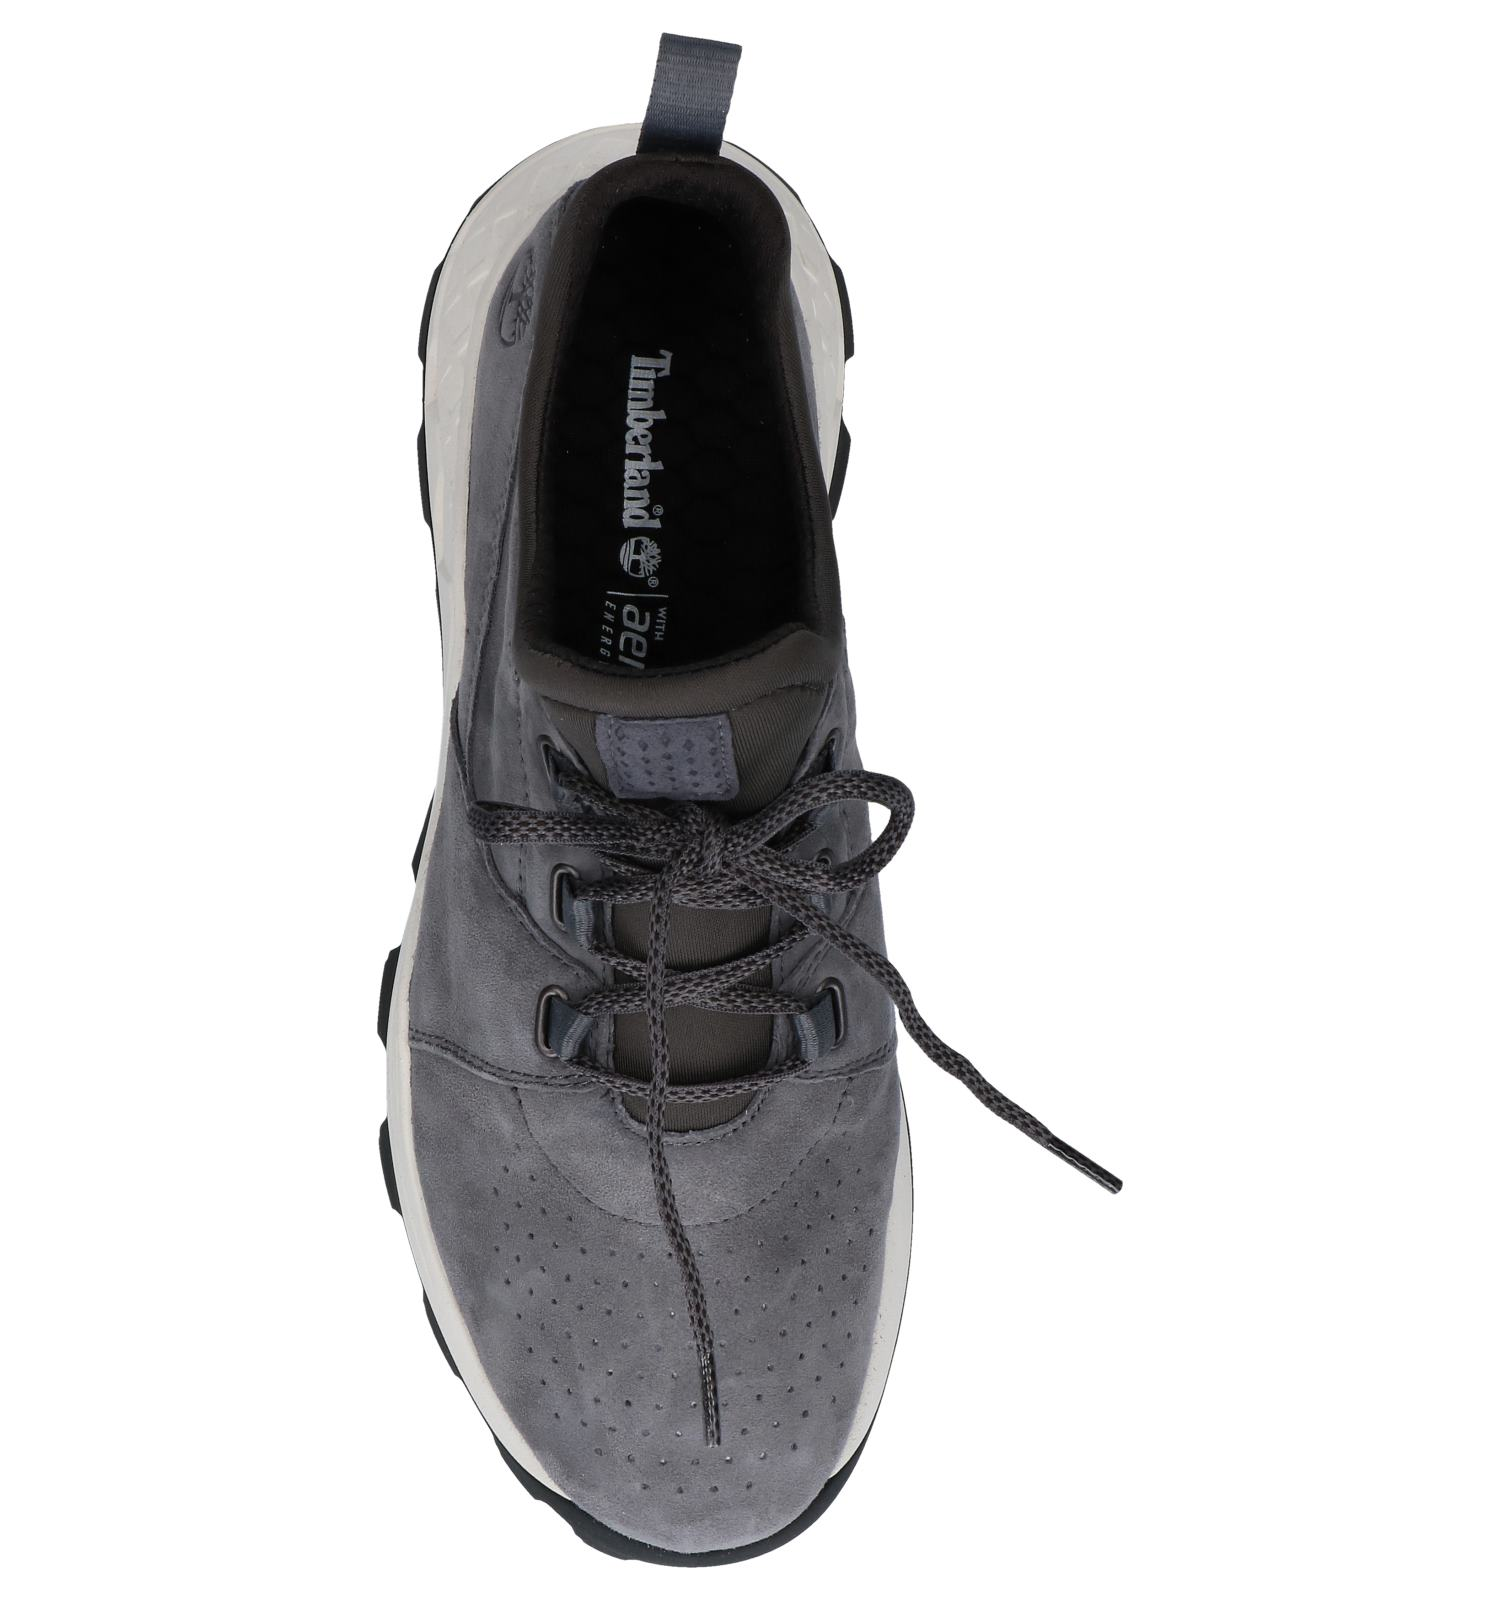 3e4d6247ea0 Grijze Sneaker Timberland Brooklyn Lace OX | TORFS.BE | Gratis verzend en  retour